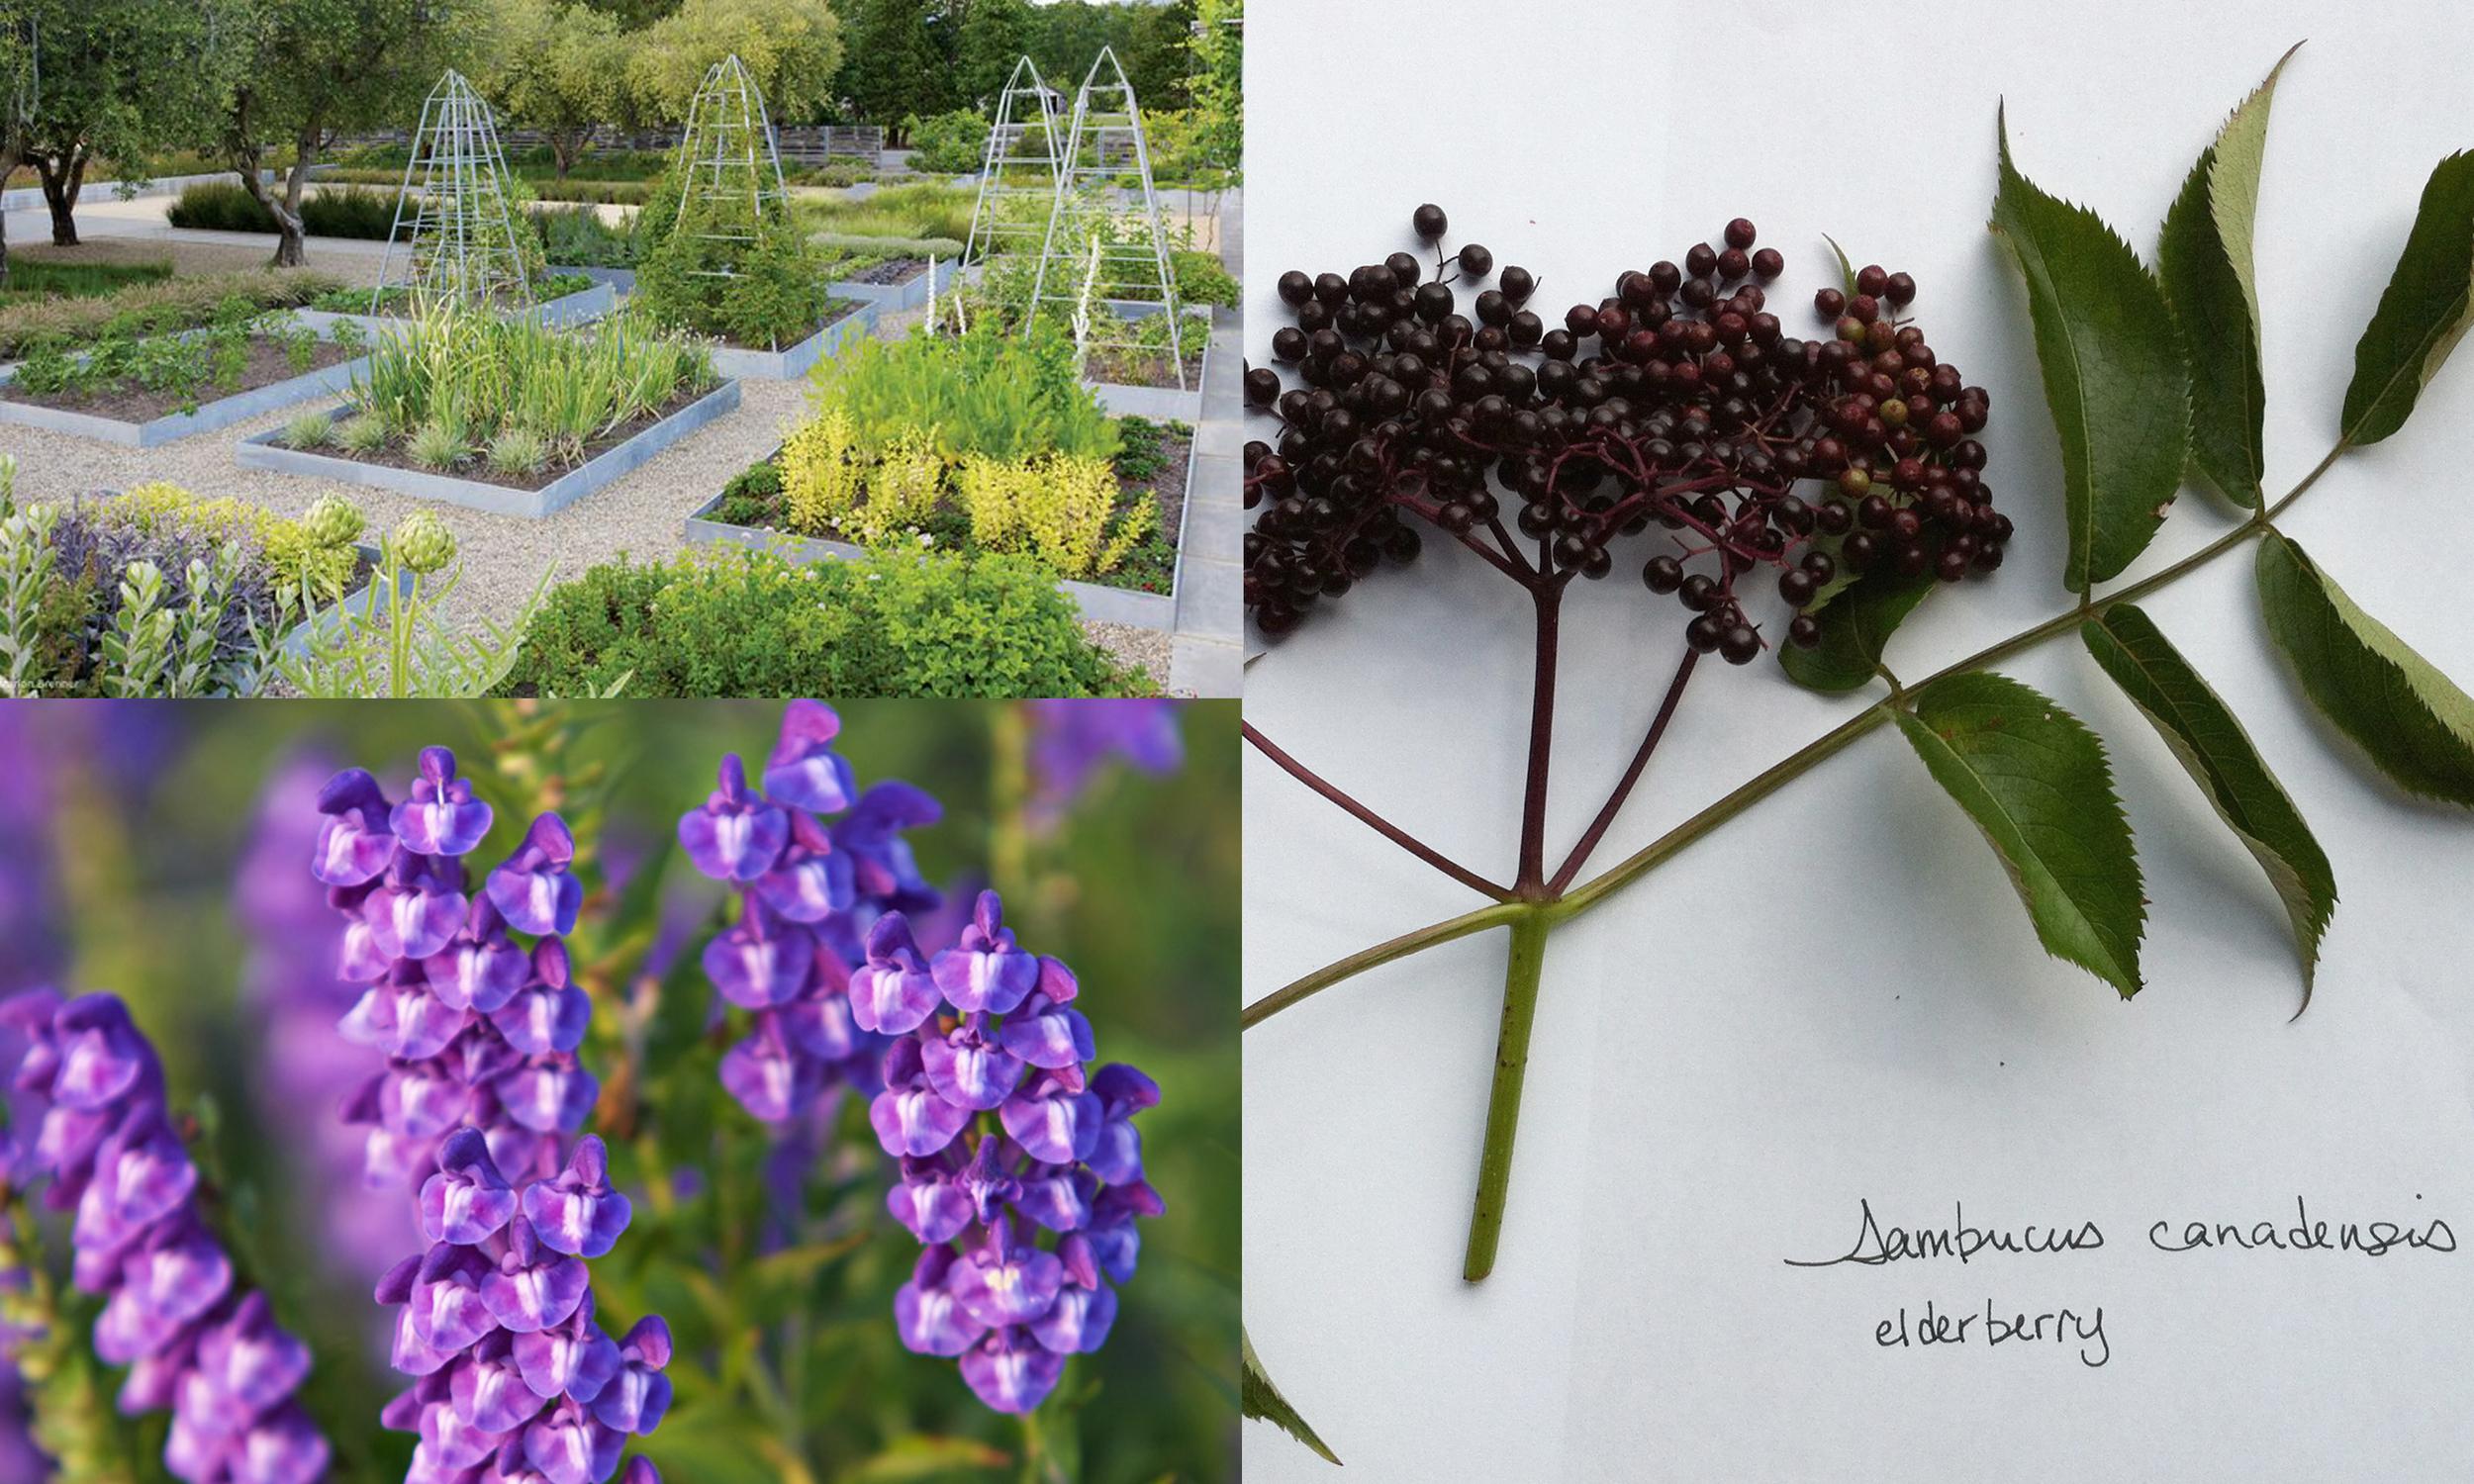 Medlock Ames Winery herb gardenby  NBWLA ,  Sambucus canadensis,   Scutellaria baicalensis